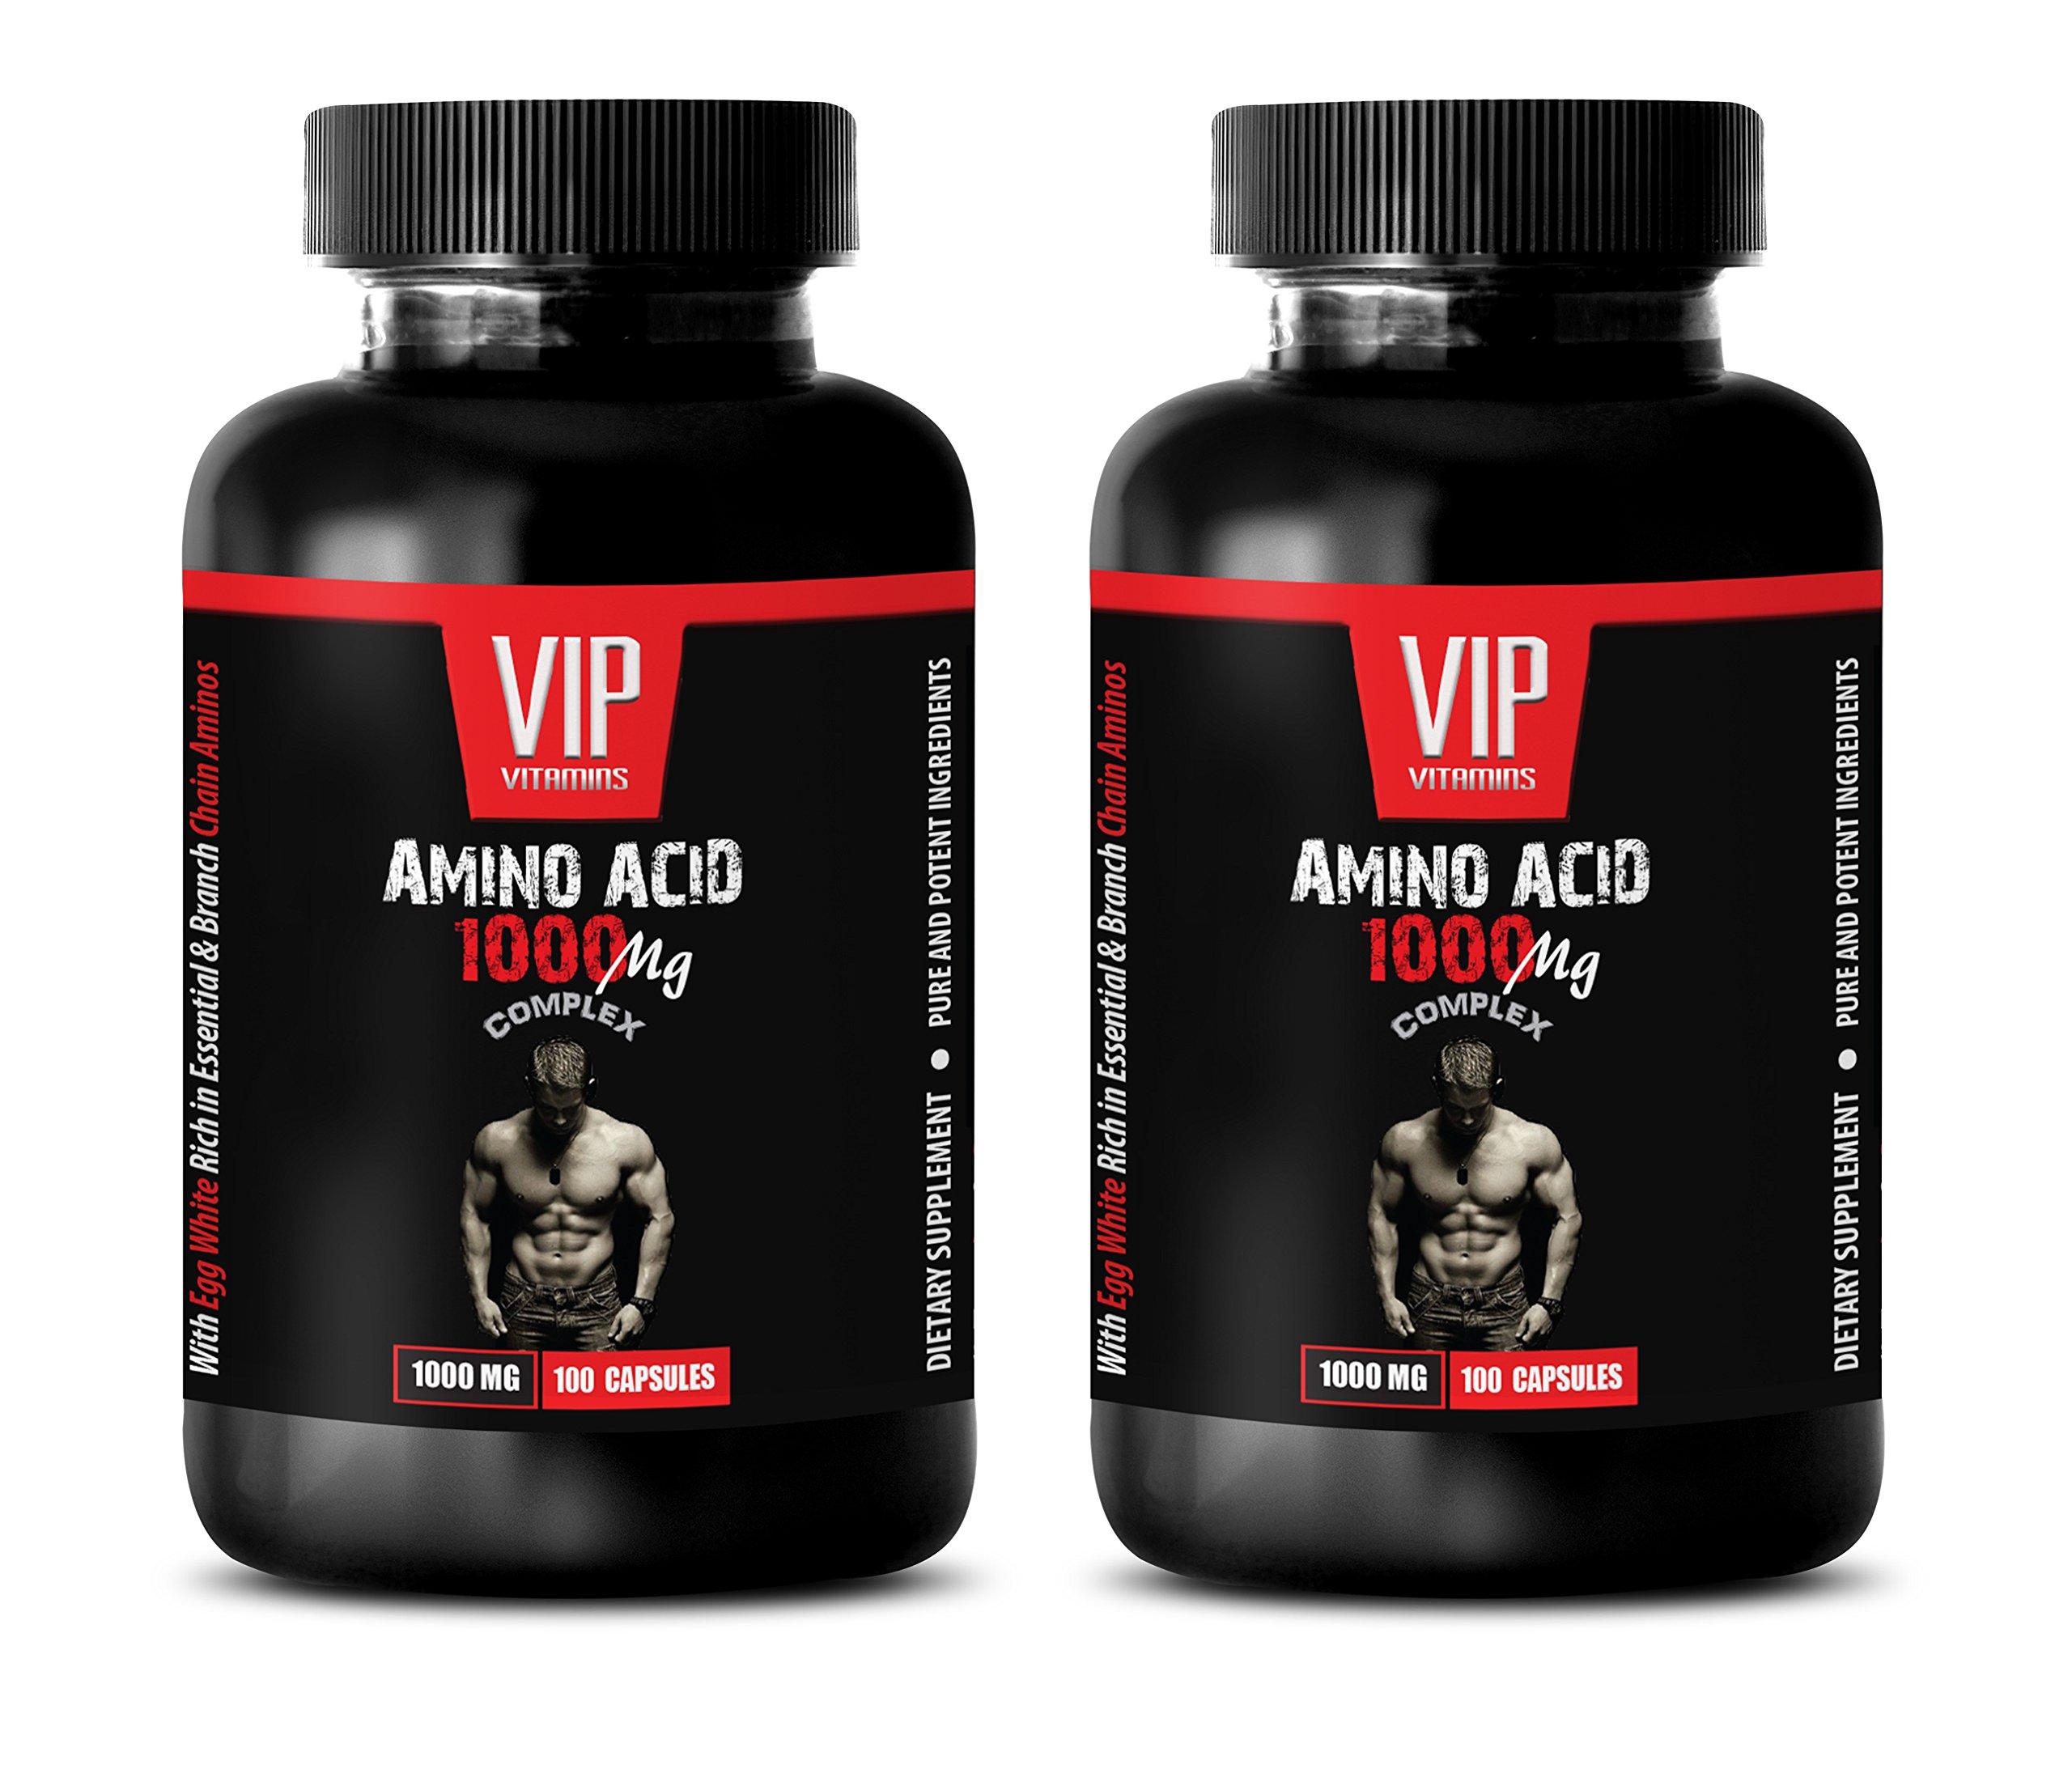 bodybuilding supplements for men - AMINO ACID 1000 MG COMPLEX - l-arginine bulk supplements - 2 Bottles 200 Capsules